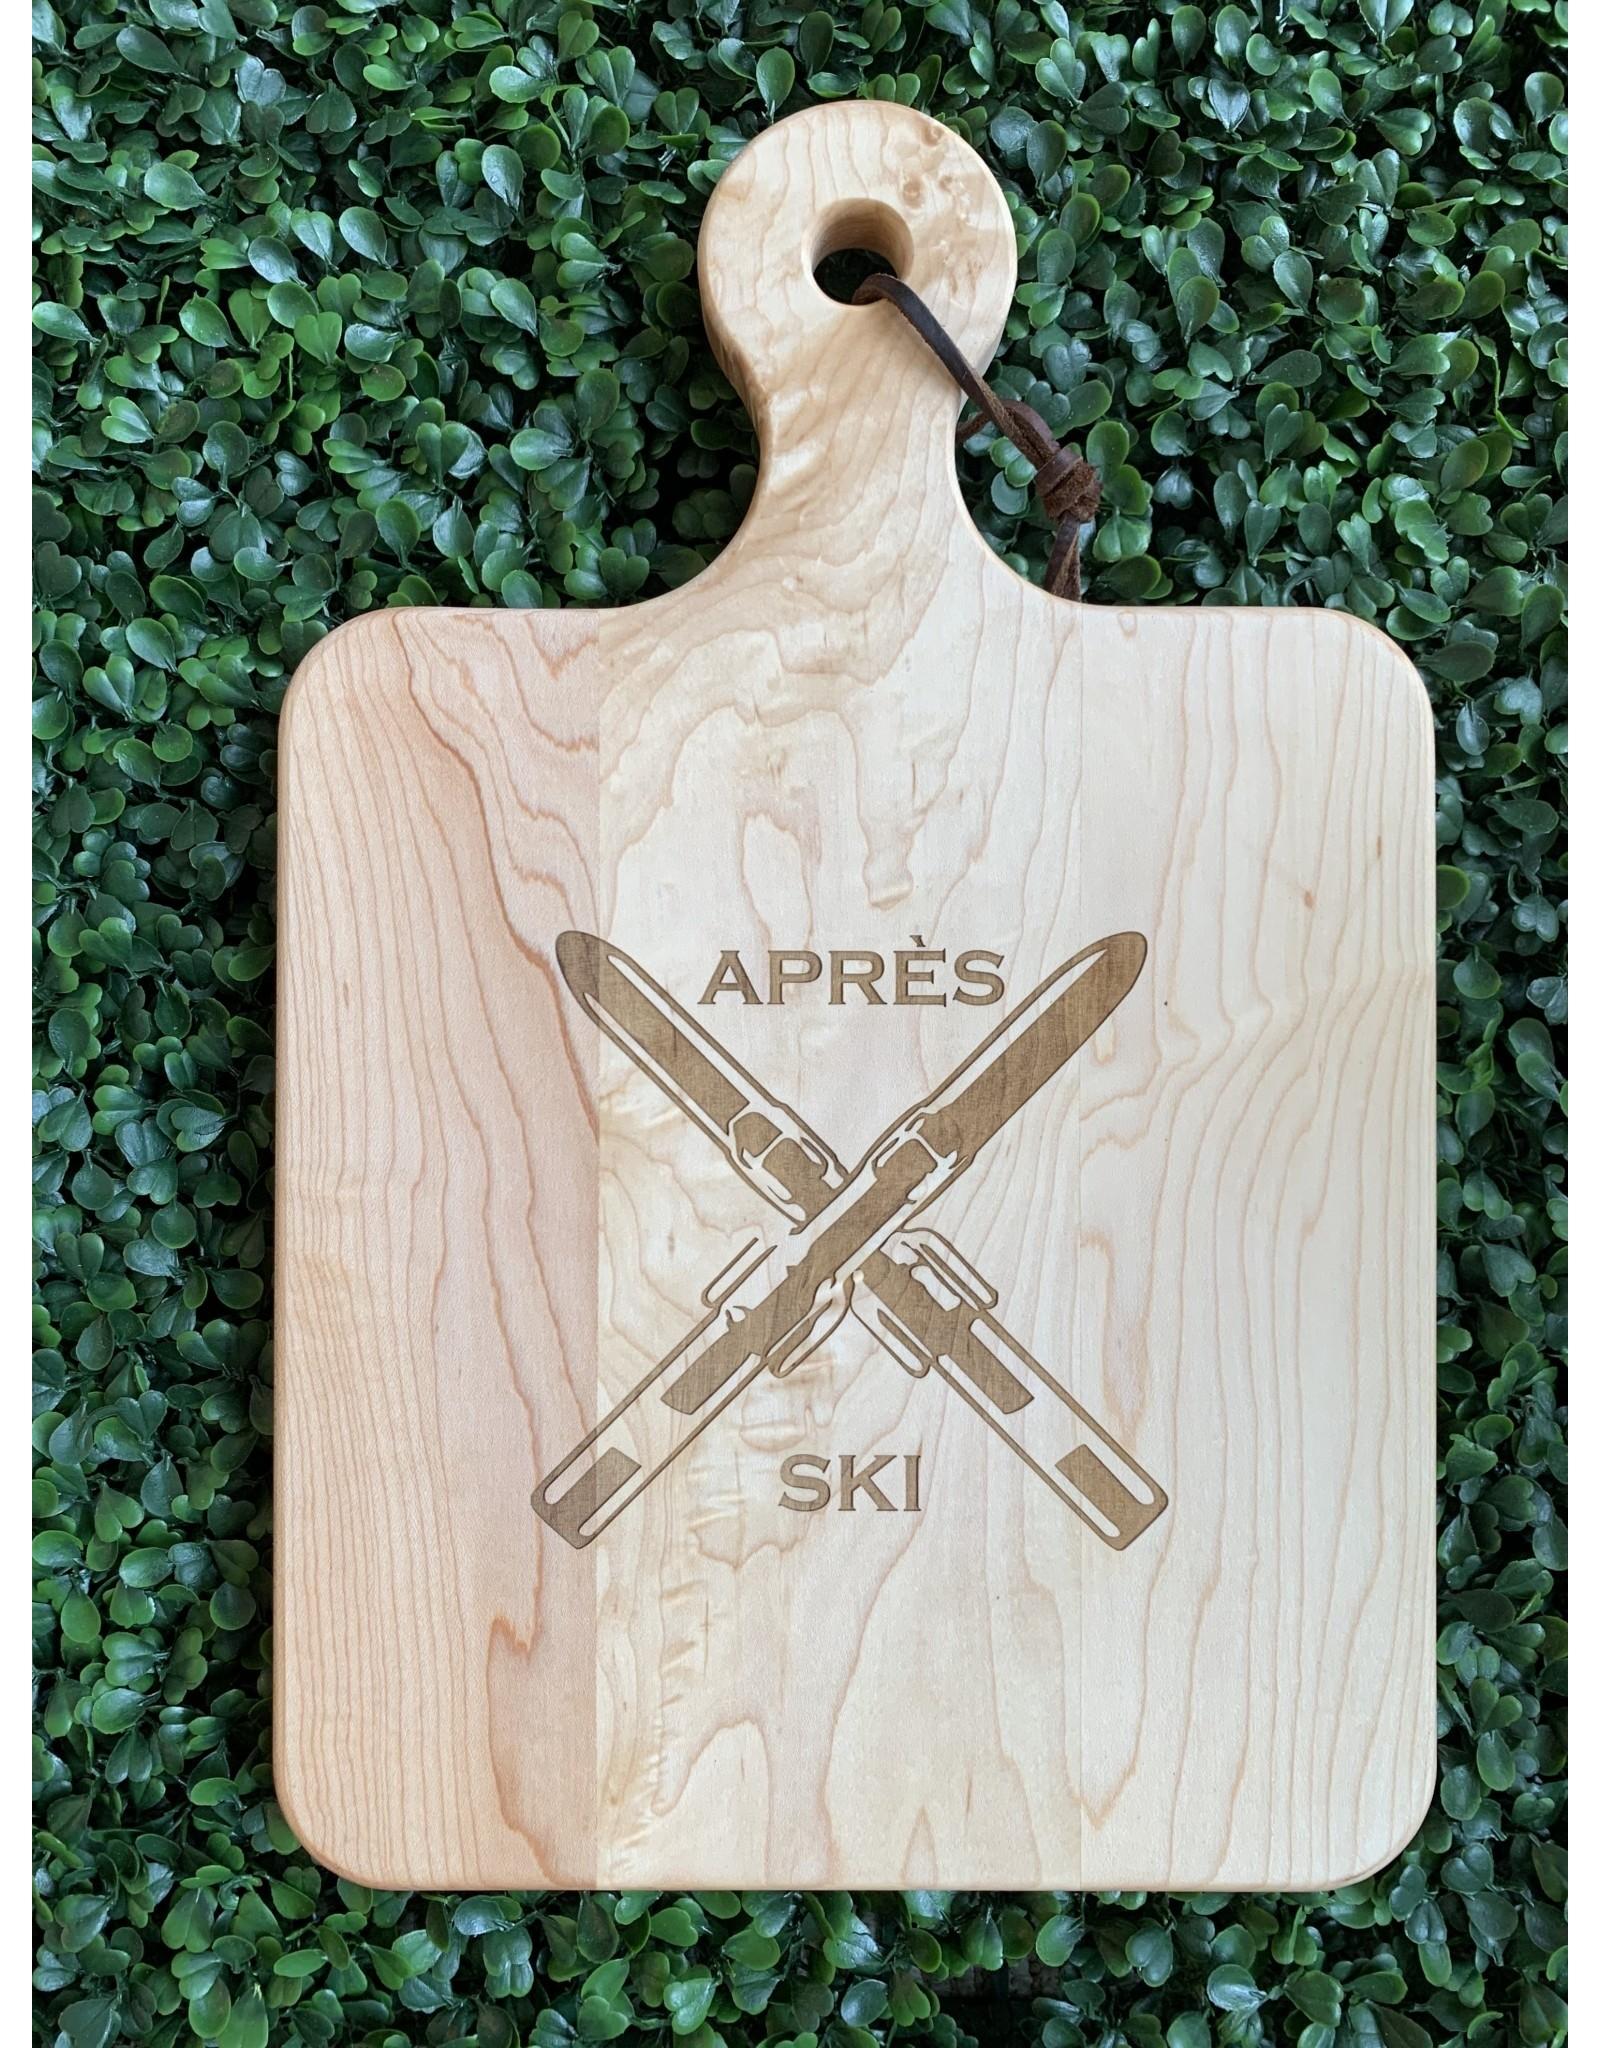 Maple Leaf at Home Apres Ski 14x9 Handled Maple Artisan Board